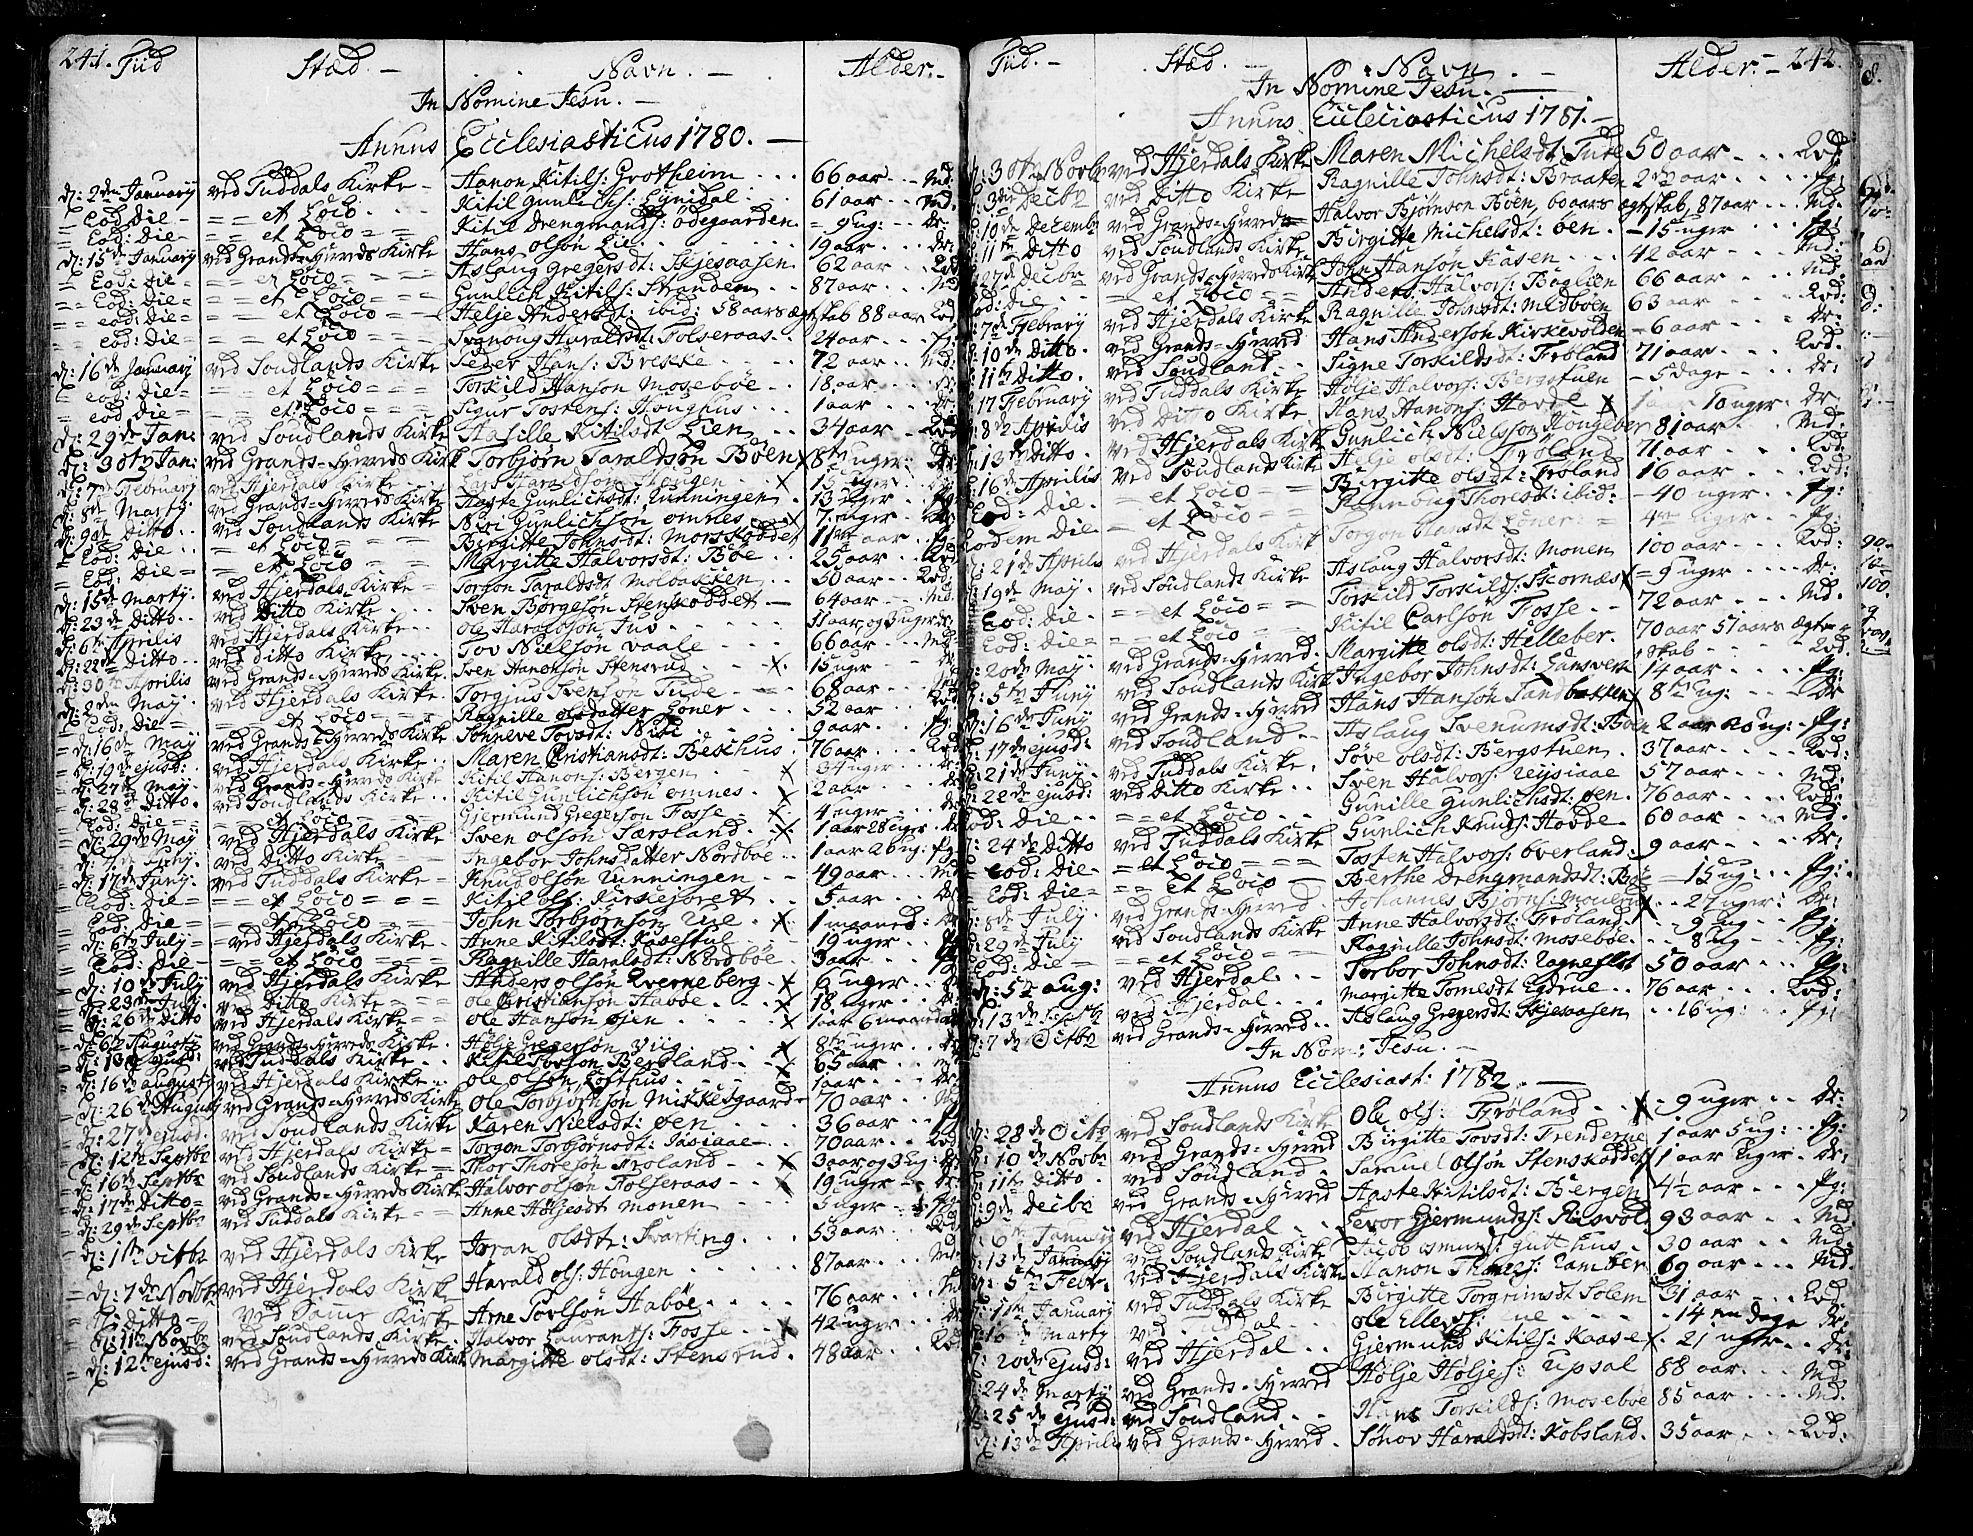 SAKO, Hjartdal kirkebøker, F/Fa/L0005: Ministerialbok nr. I 5, 1776-1801, s. 241-242